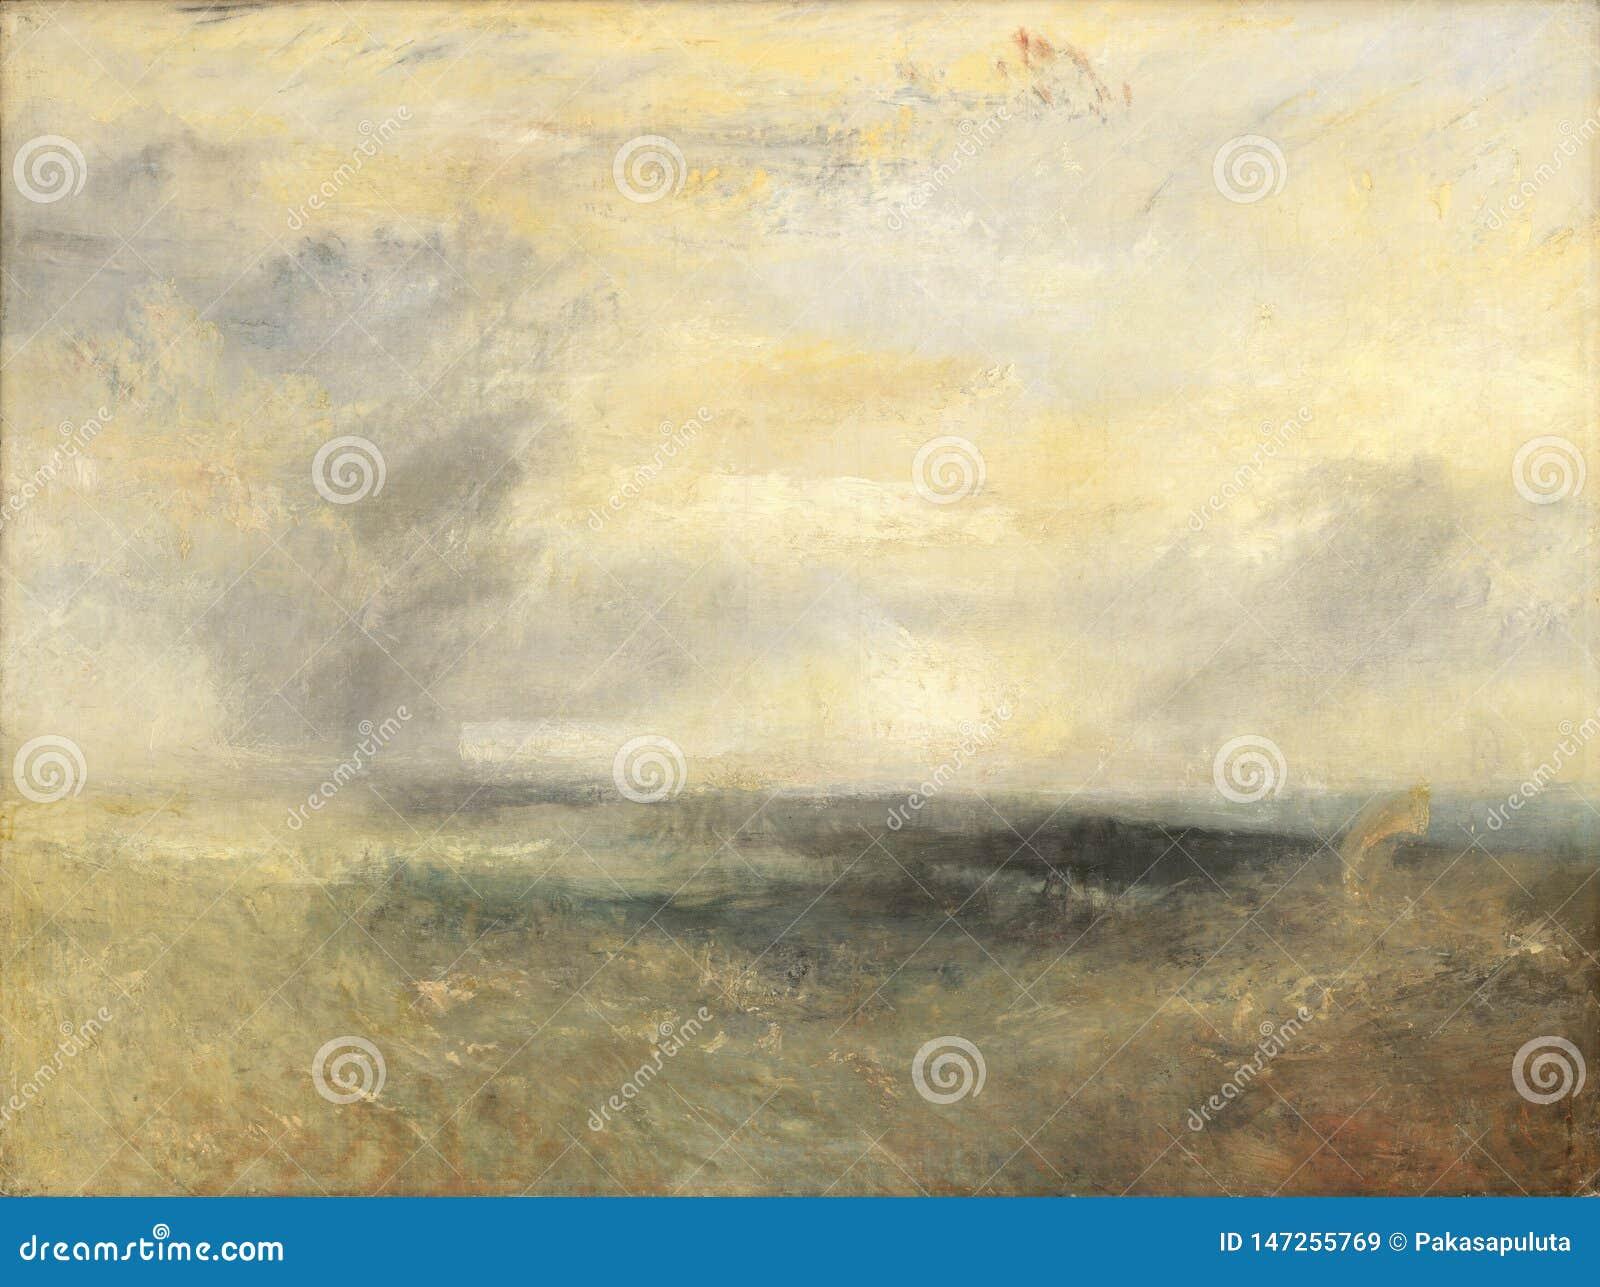 Joseph Mallord William Turner - Margate, vom Meer